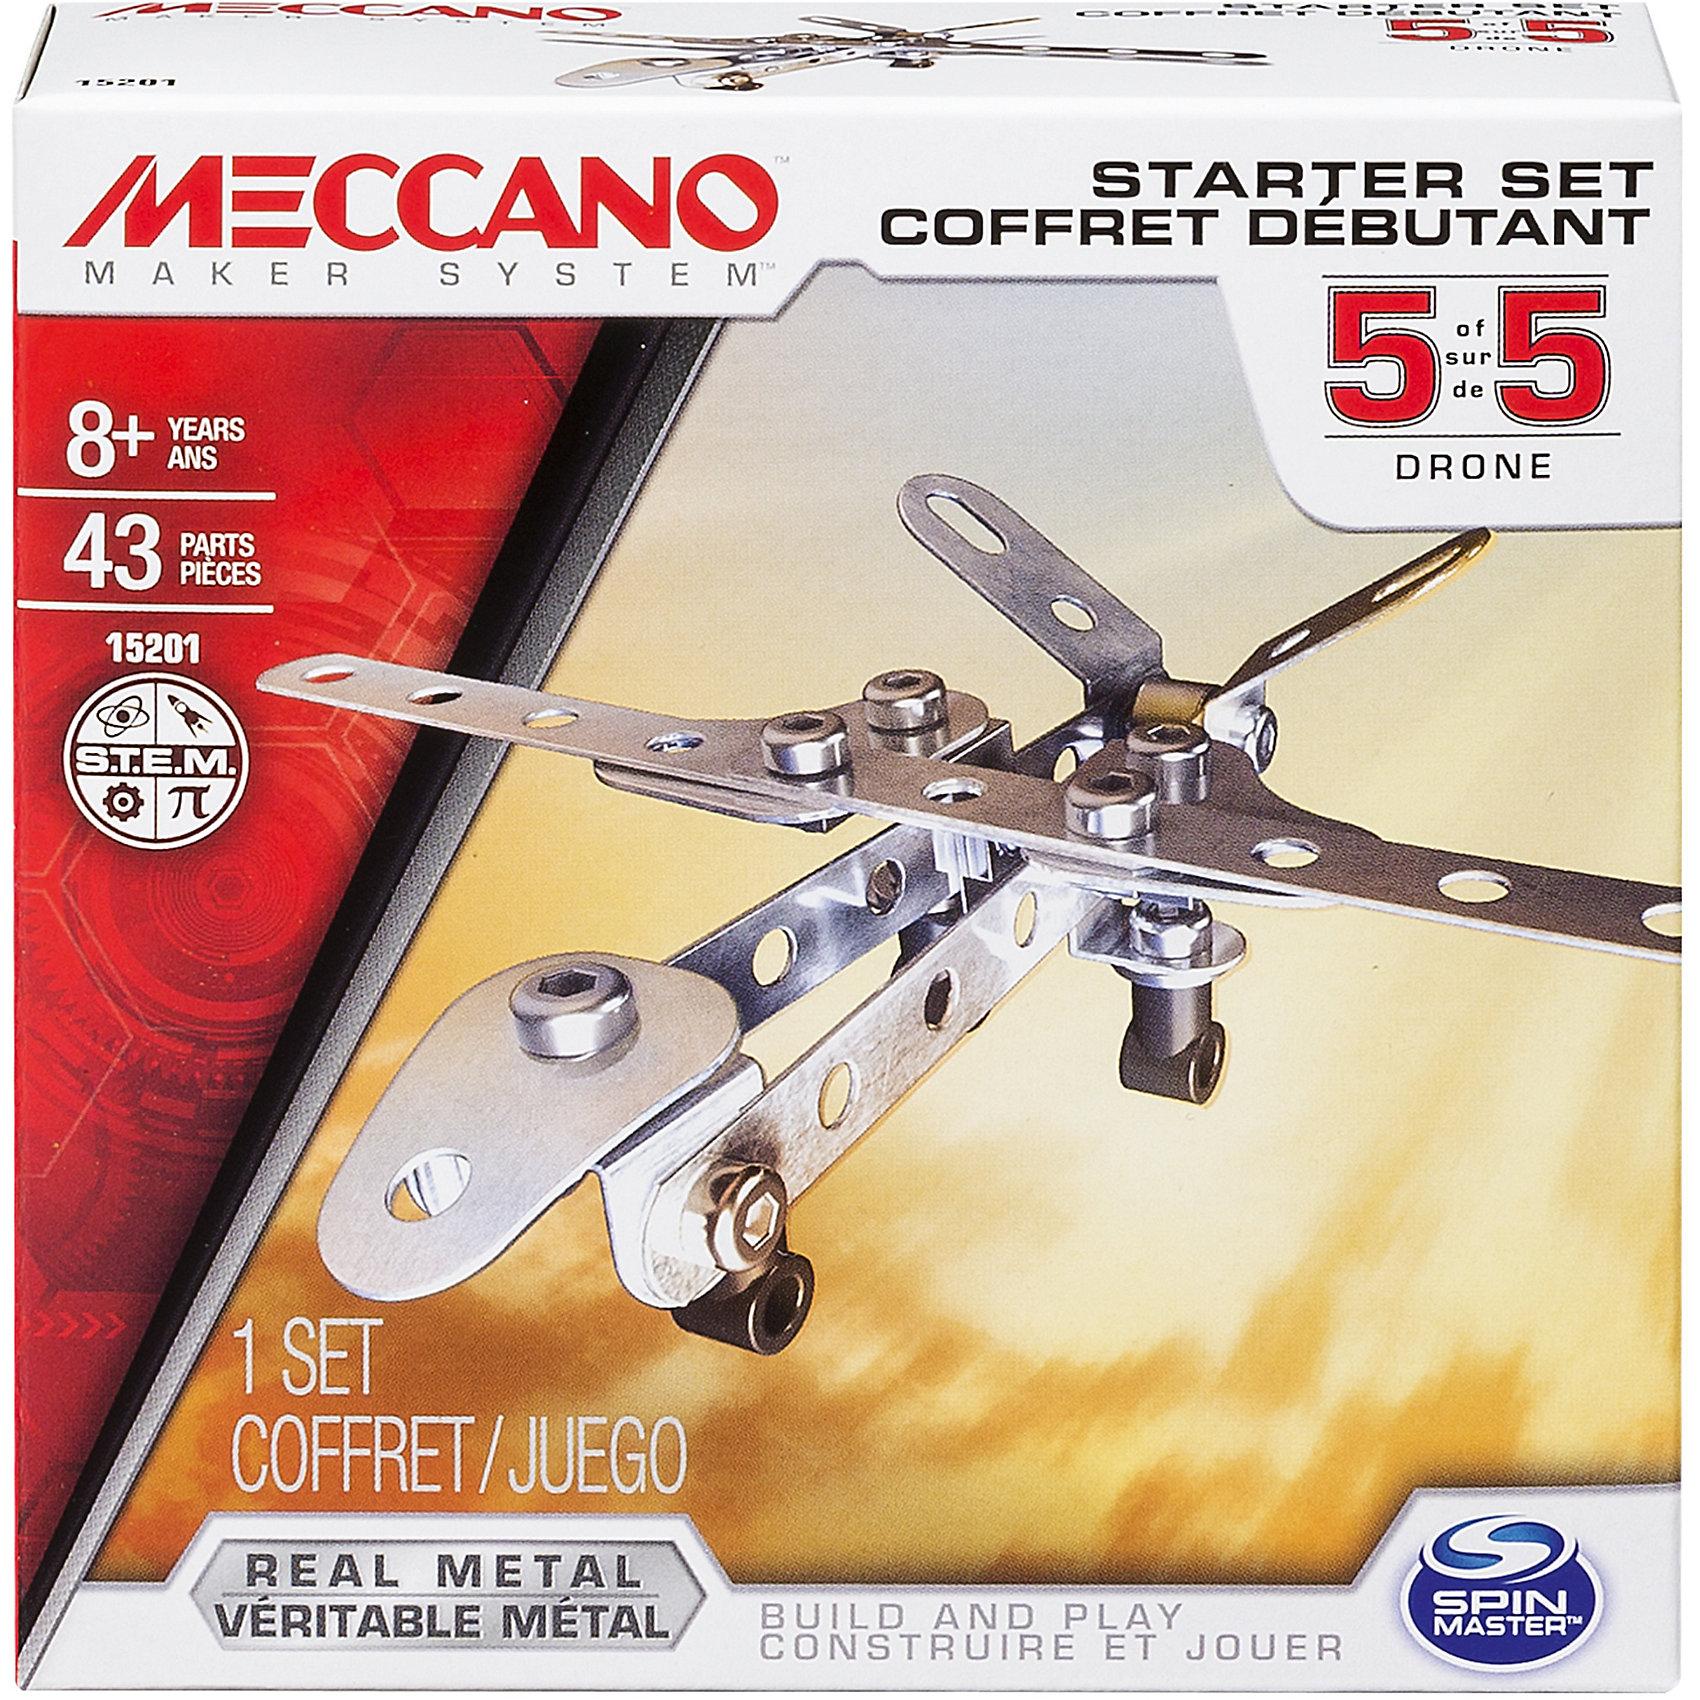 Базовая модель Дрон, MeccanoСамолёты и вертолёты<br><br><br>Ширина мм: 130<br>Глубина мм: 130<br>Высота мм: 40<br>Вес г: 143<br>Возраст от месяцев: 96<br>Возраст до месяцев: 144<br>Пол: Мужской<br>Возраст: Детский<br>SKU: 5377746